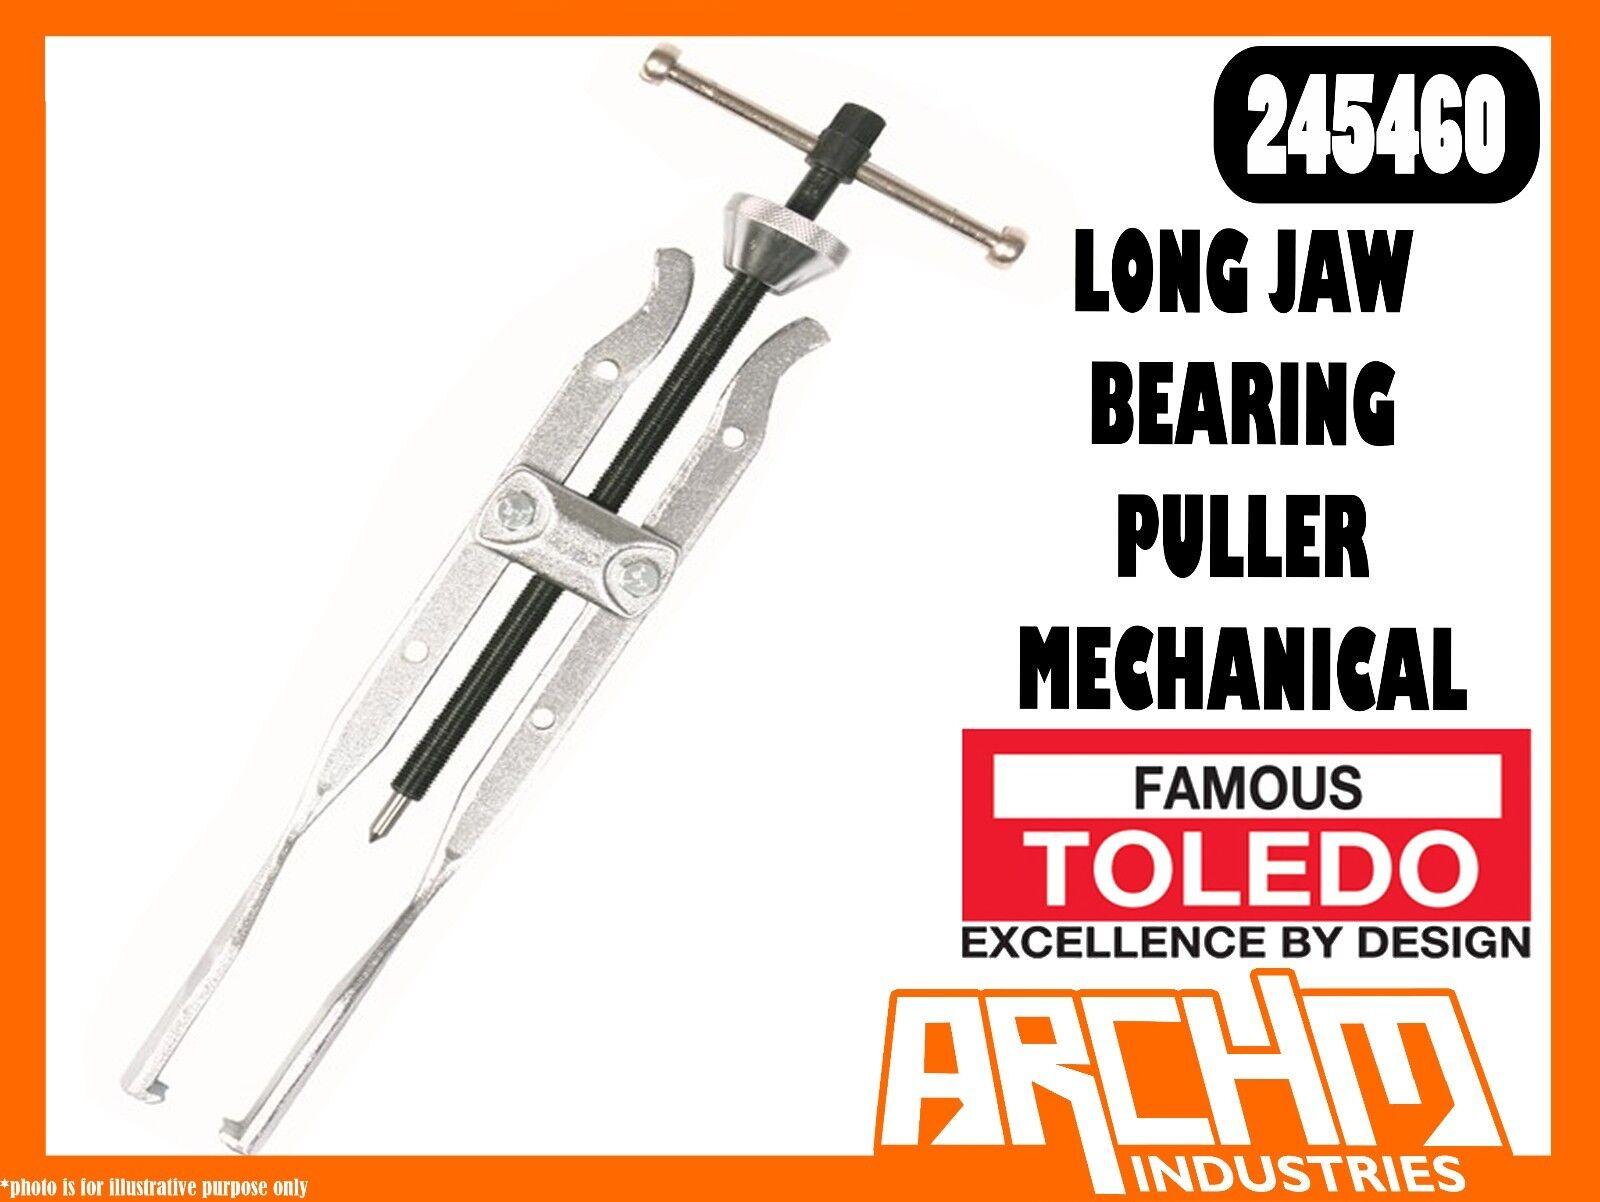 TOLEDO 245460 - LONG JAW BEARING PULLER MECHANICAL - FORCING SCREW REVERSIBLE